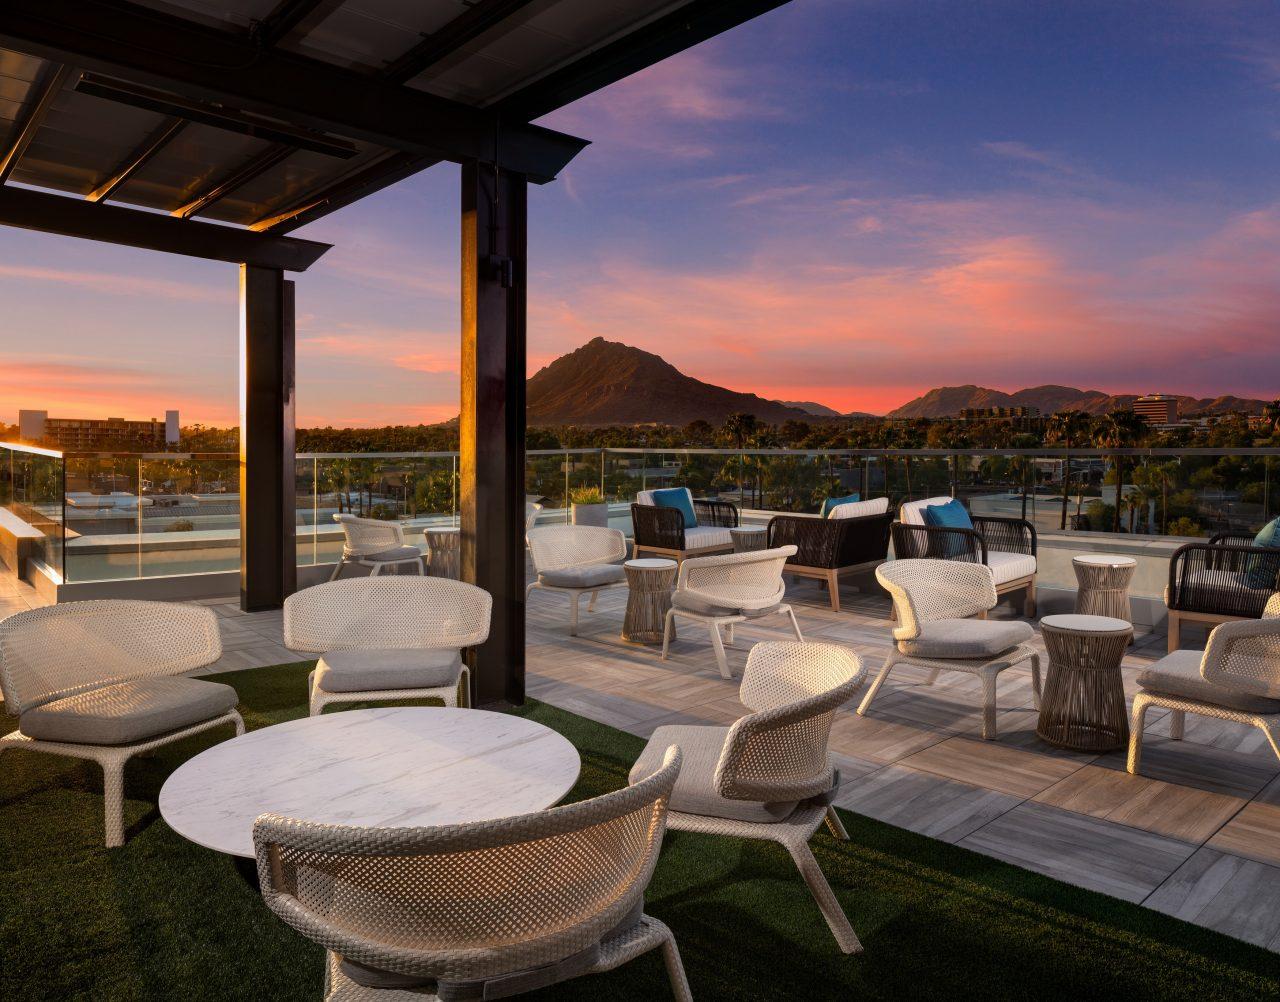 https://www.phoenixmag.com/wp-content/uploads/2021/07/Canopy-Scottsdale_Rooftop_14-1280x1002.jpg